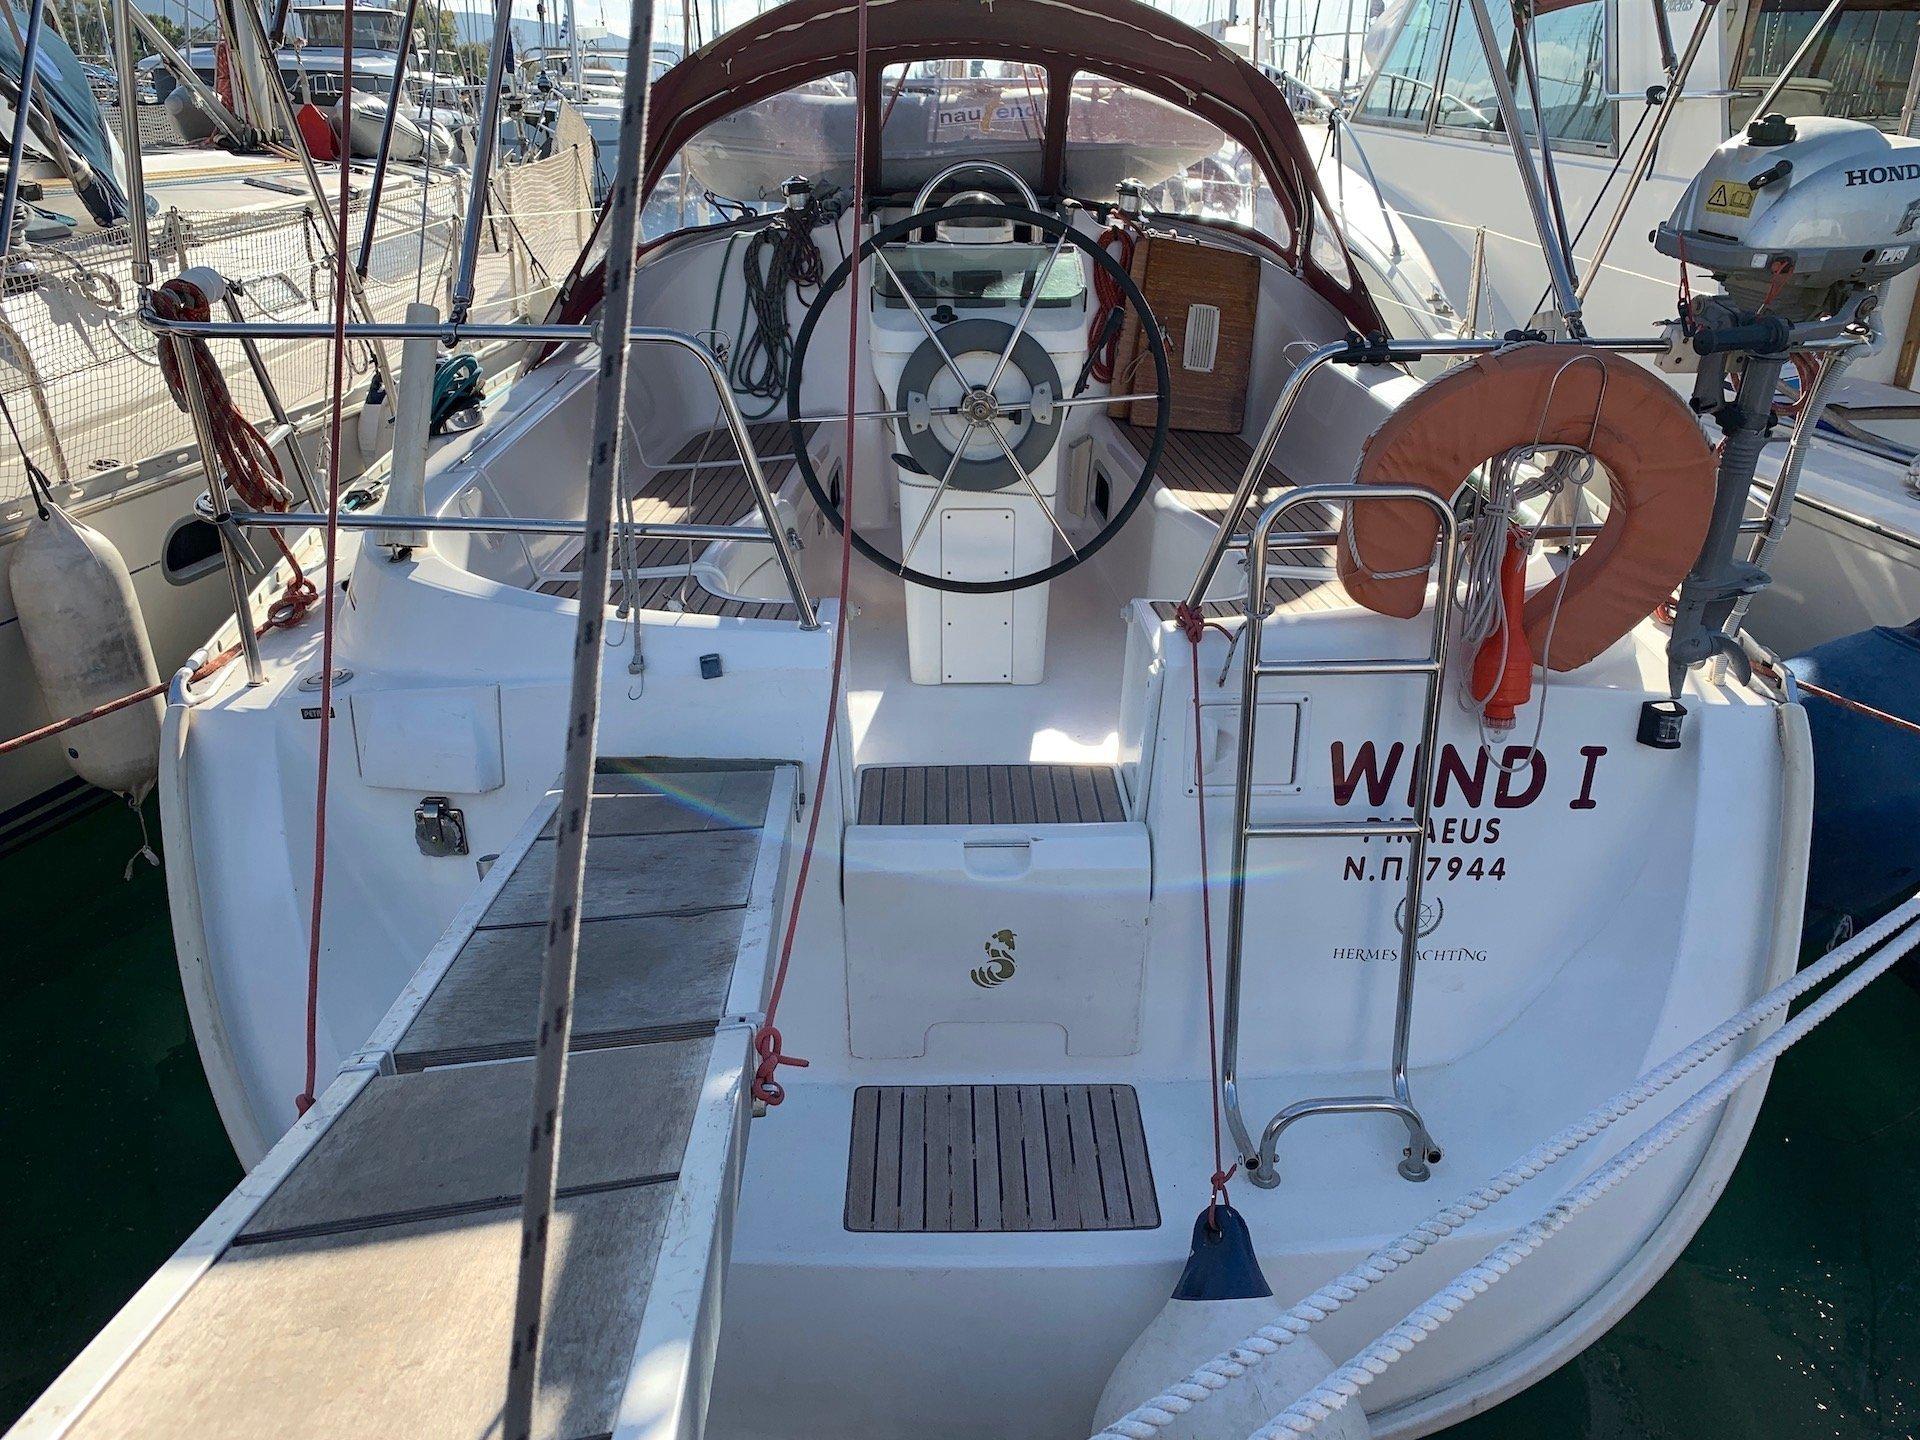 Oceanis Clipper 331 (Wind 1)  - 2